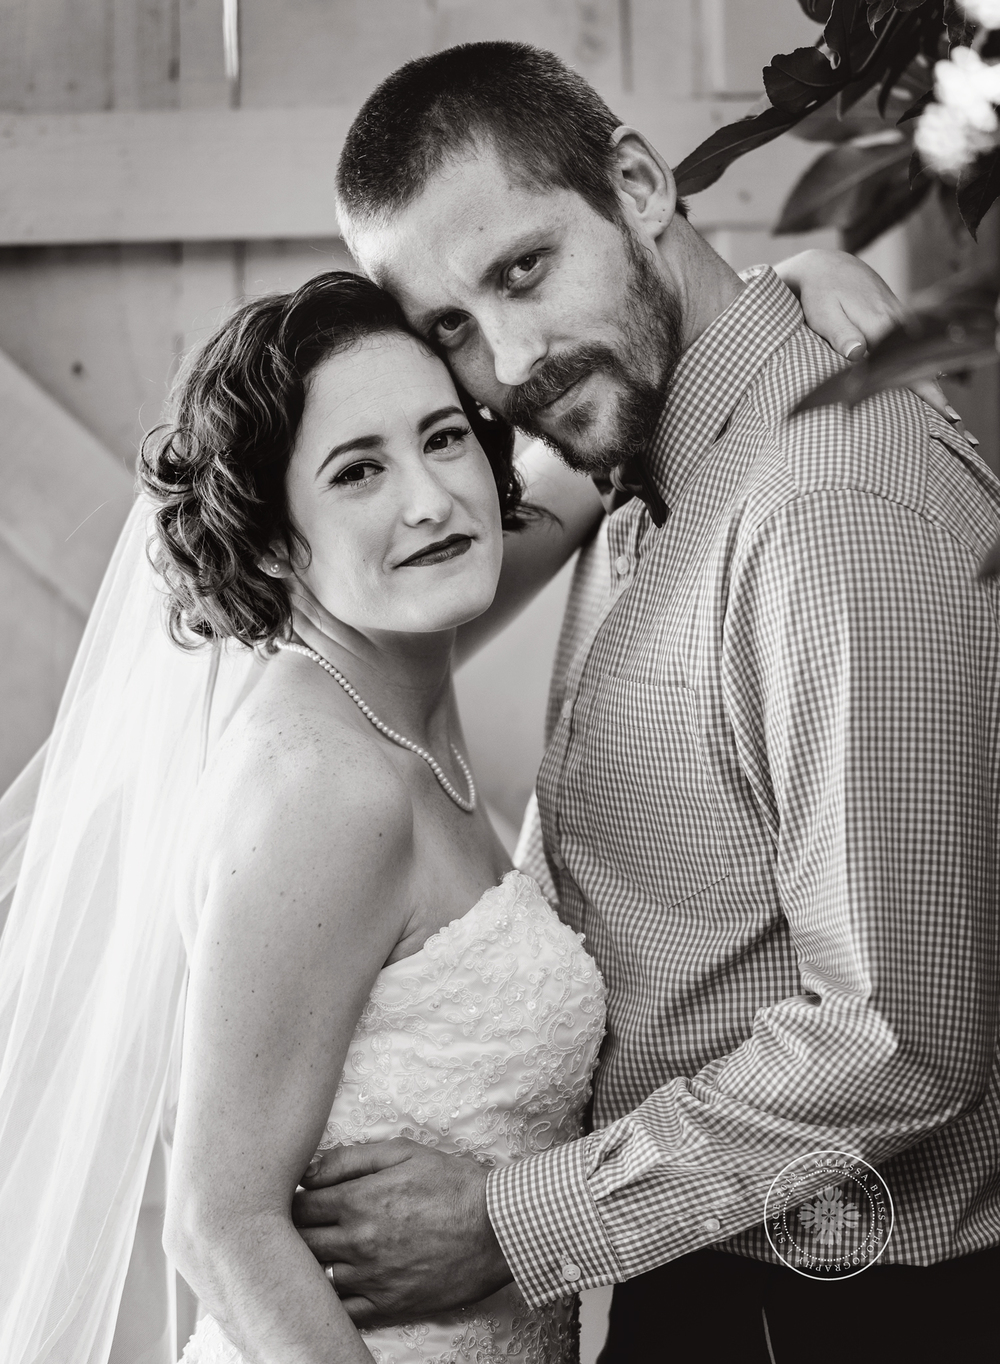 melissa-bliss-photography-weddings-virginia-beach-wedding-photographers-norfolk-portsmouth-chesapeake-wedding-photographer